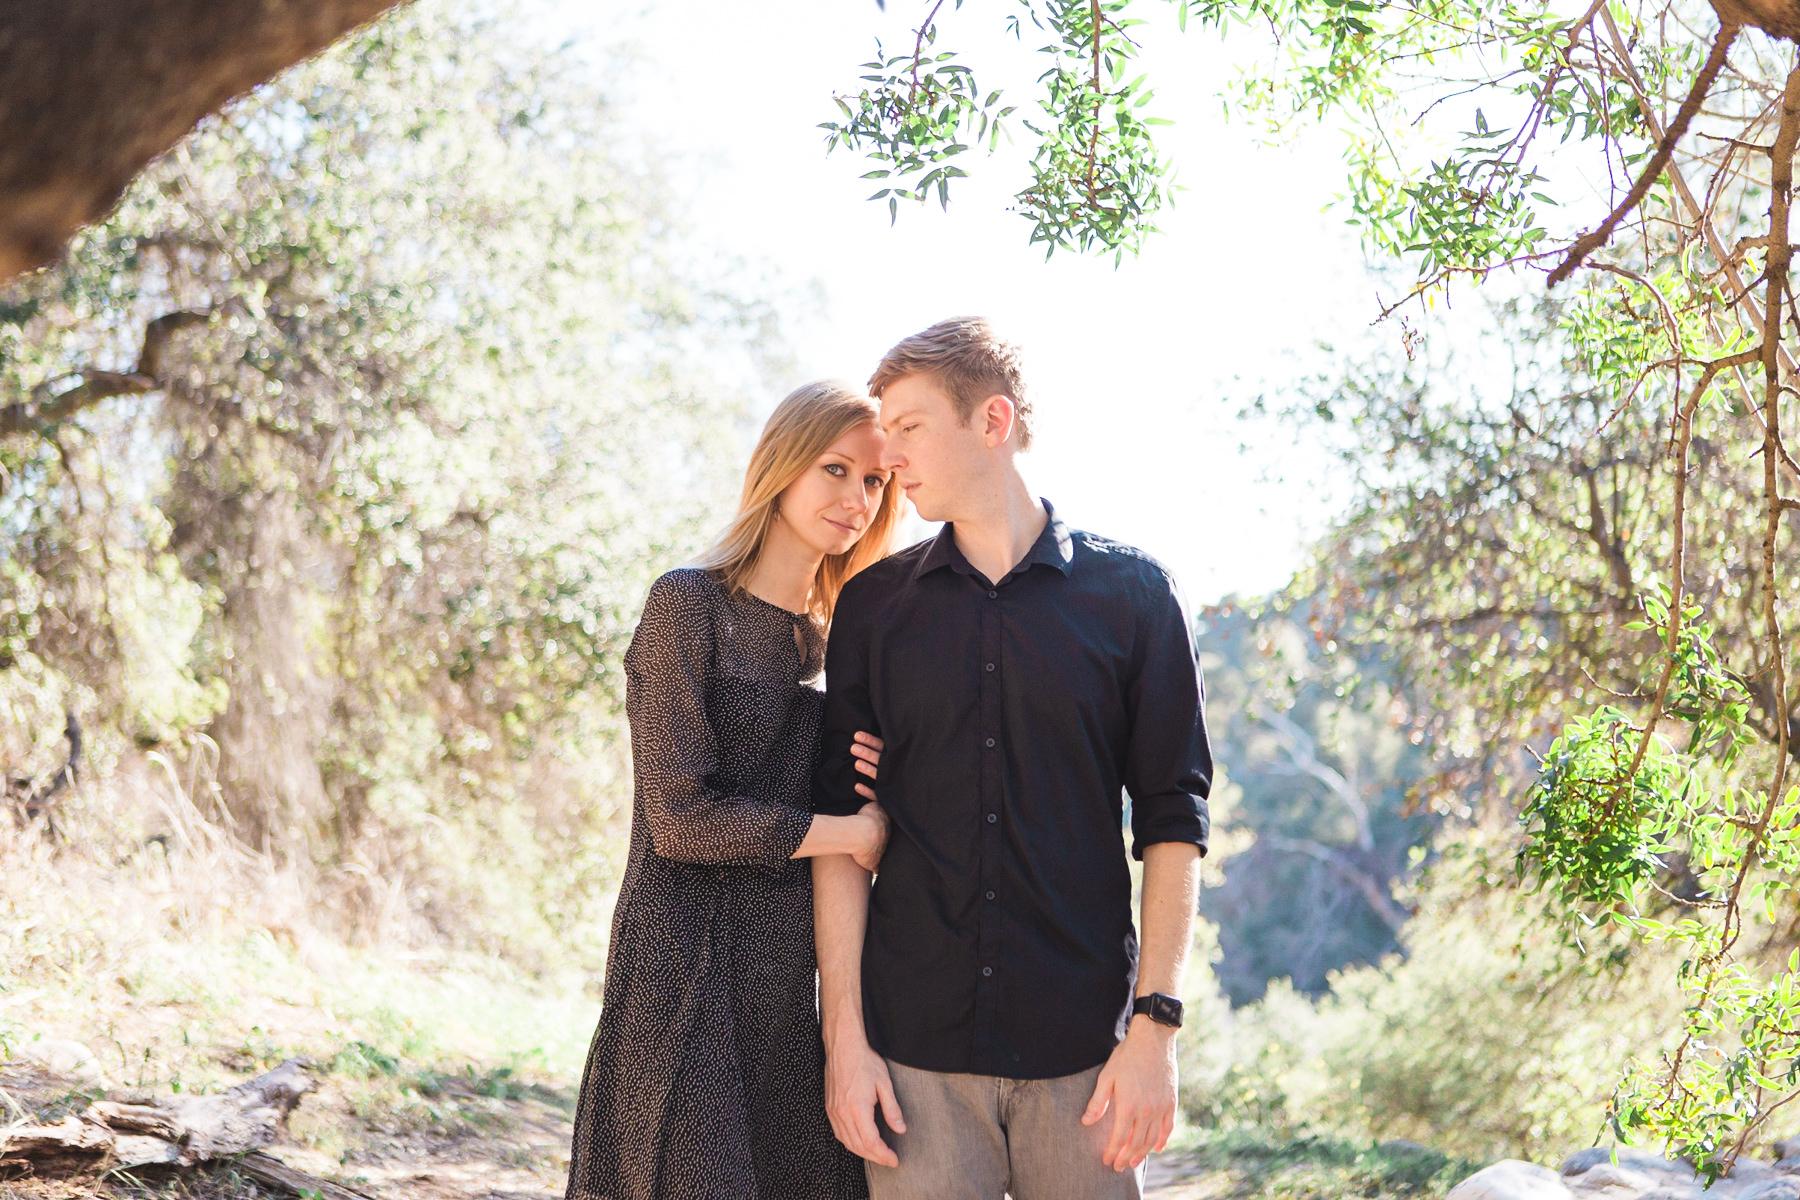 thelightandglass-wedding-engagement-photography-151119-14-14-TLG-01.jpg